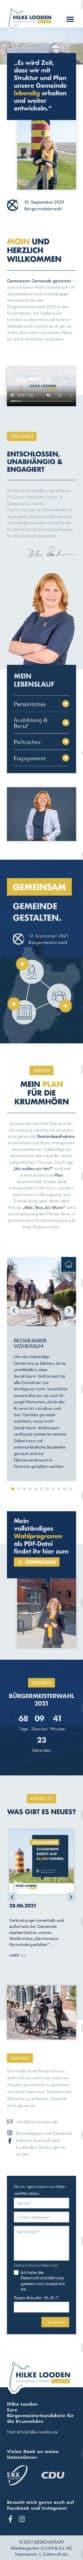 Designstuuv Referenzen Hilke Looden Website Mobil